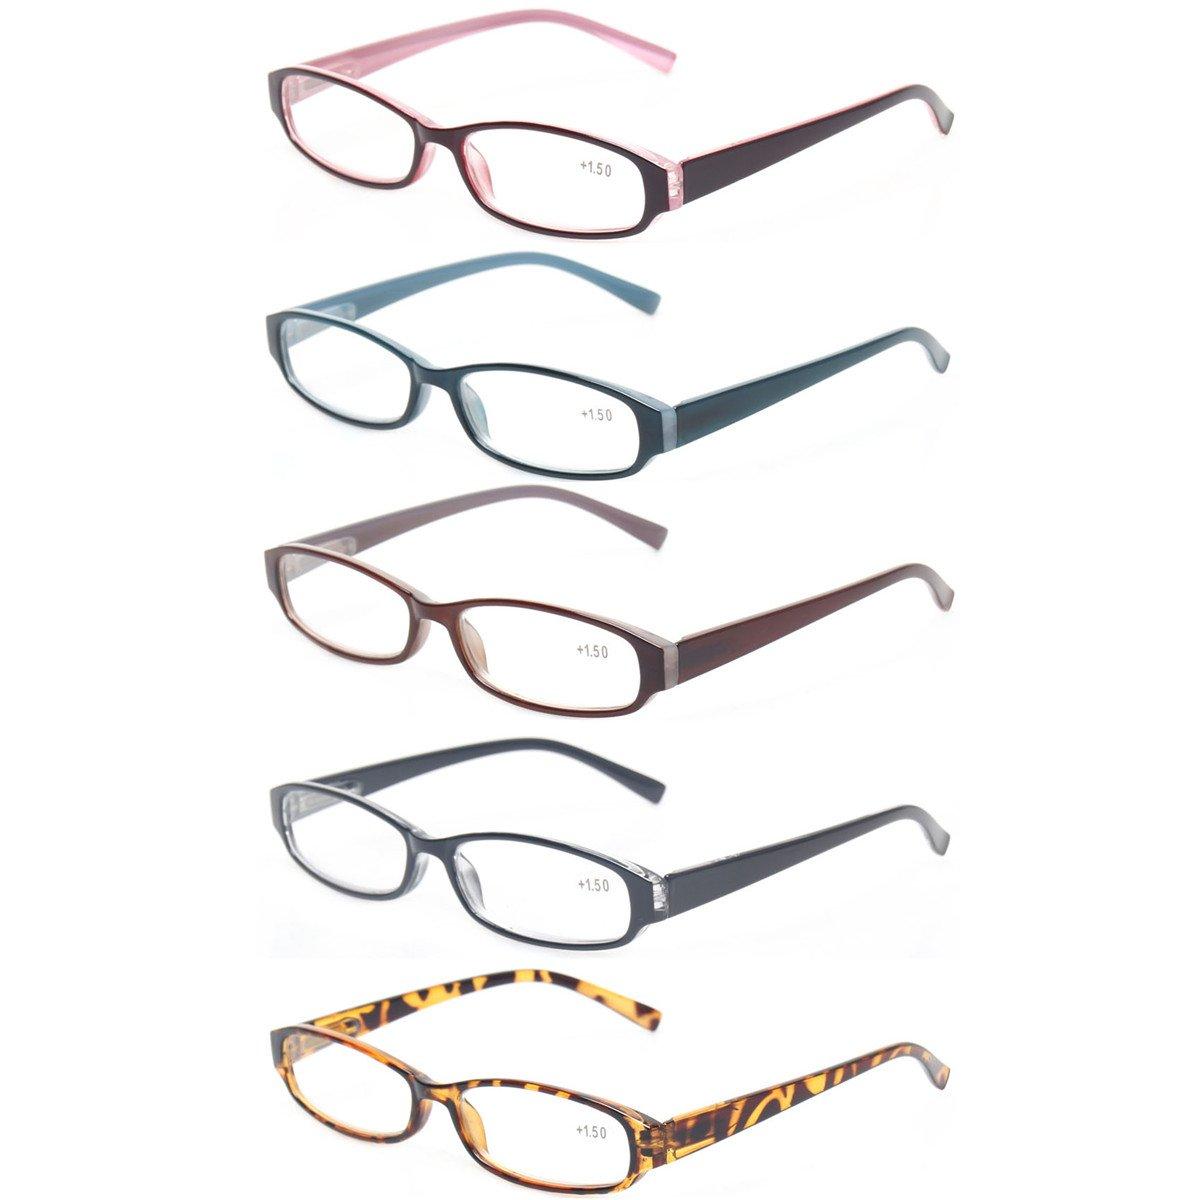 296944c9c33e Reading Glasses 5 Pairs Quality Fashion Men Women Spring Hinge Readers  product image